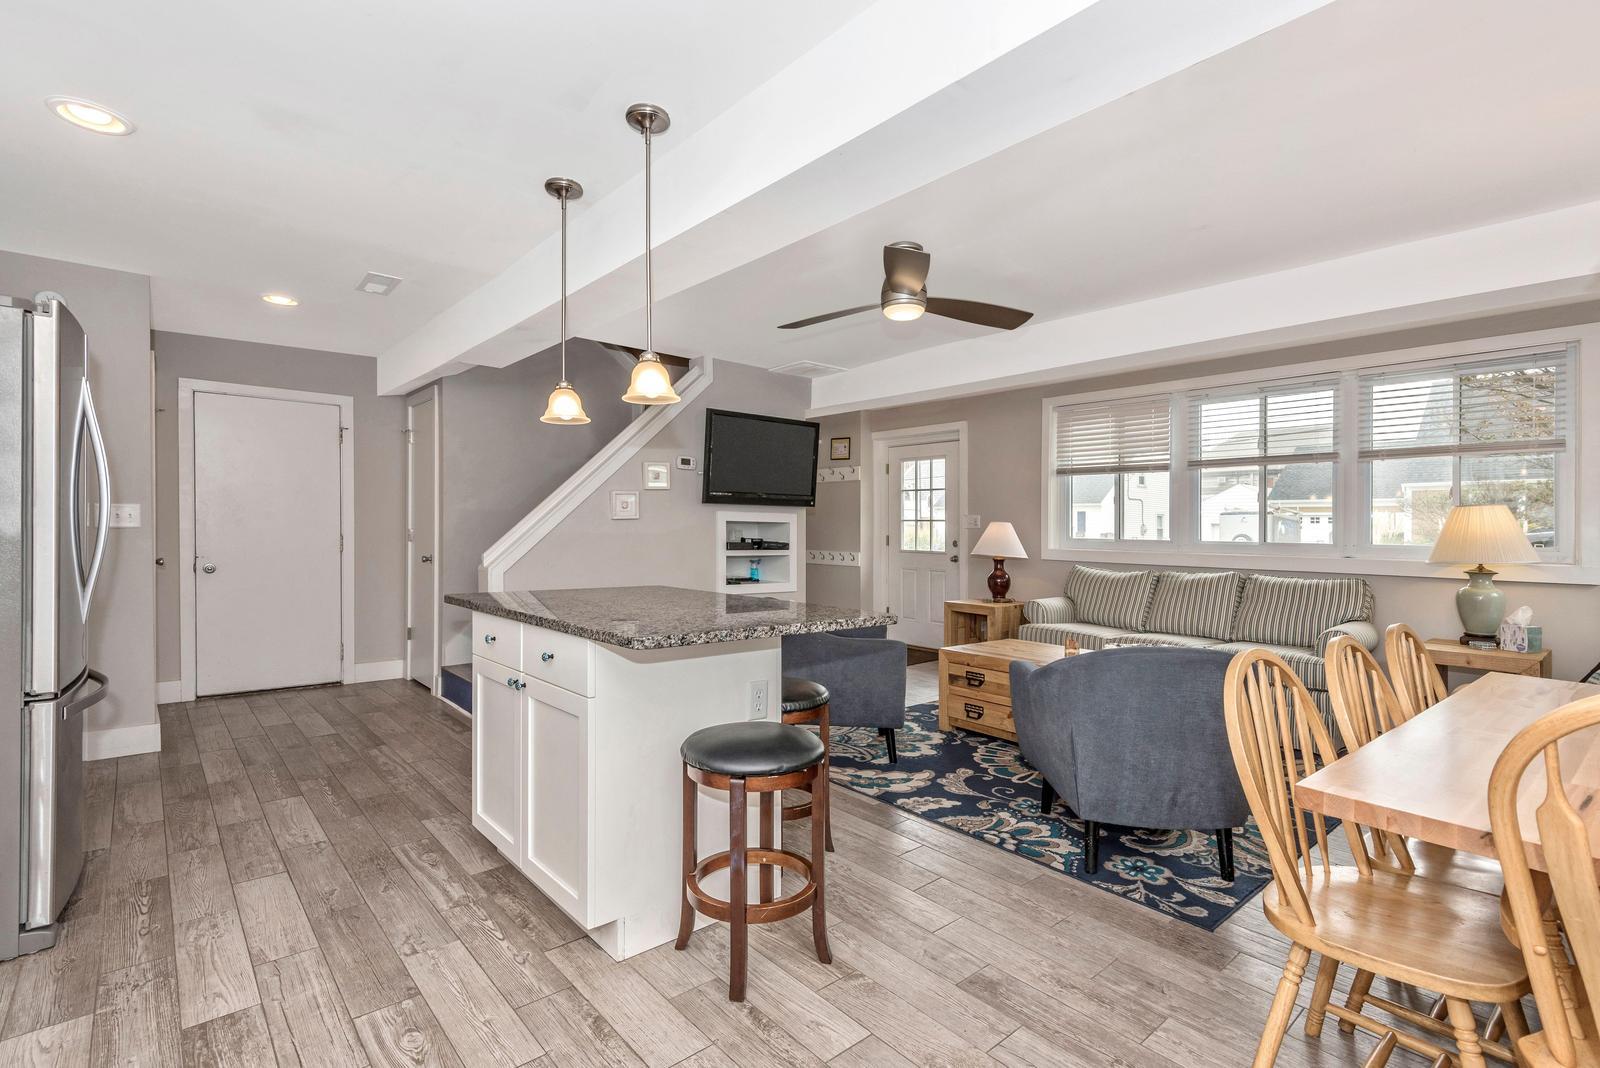 Garage, stairs, and half bath off of kitchen area